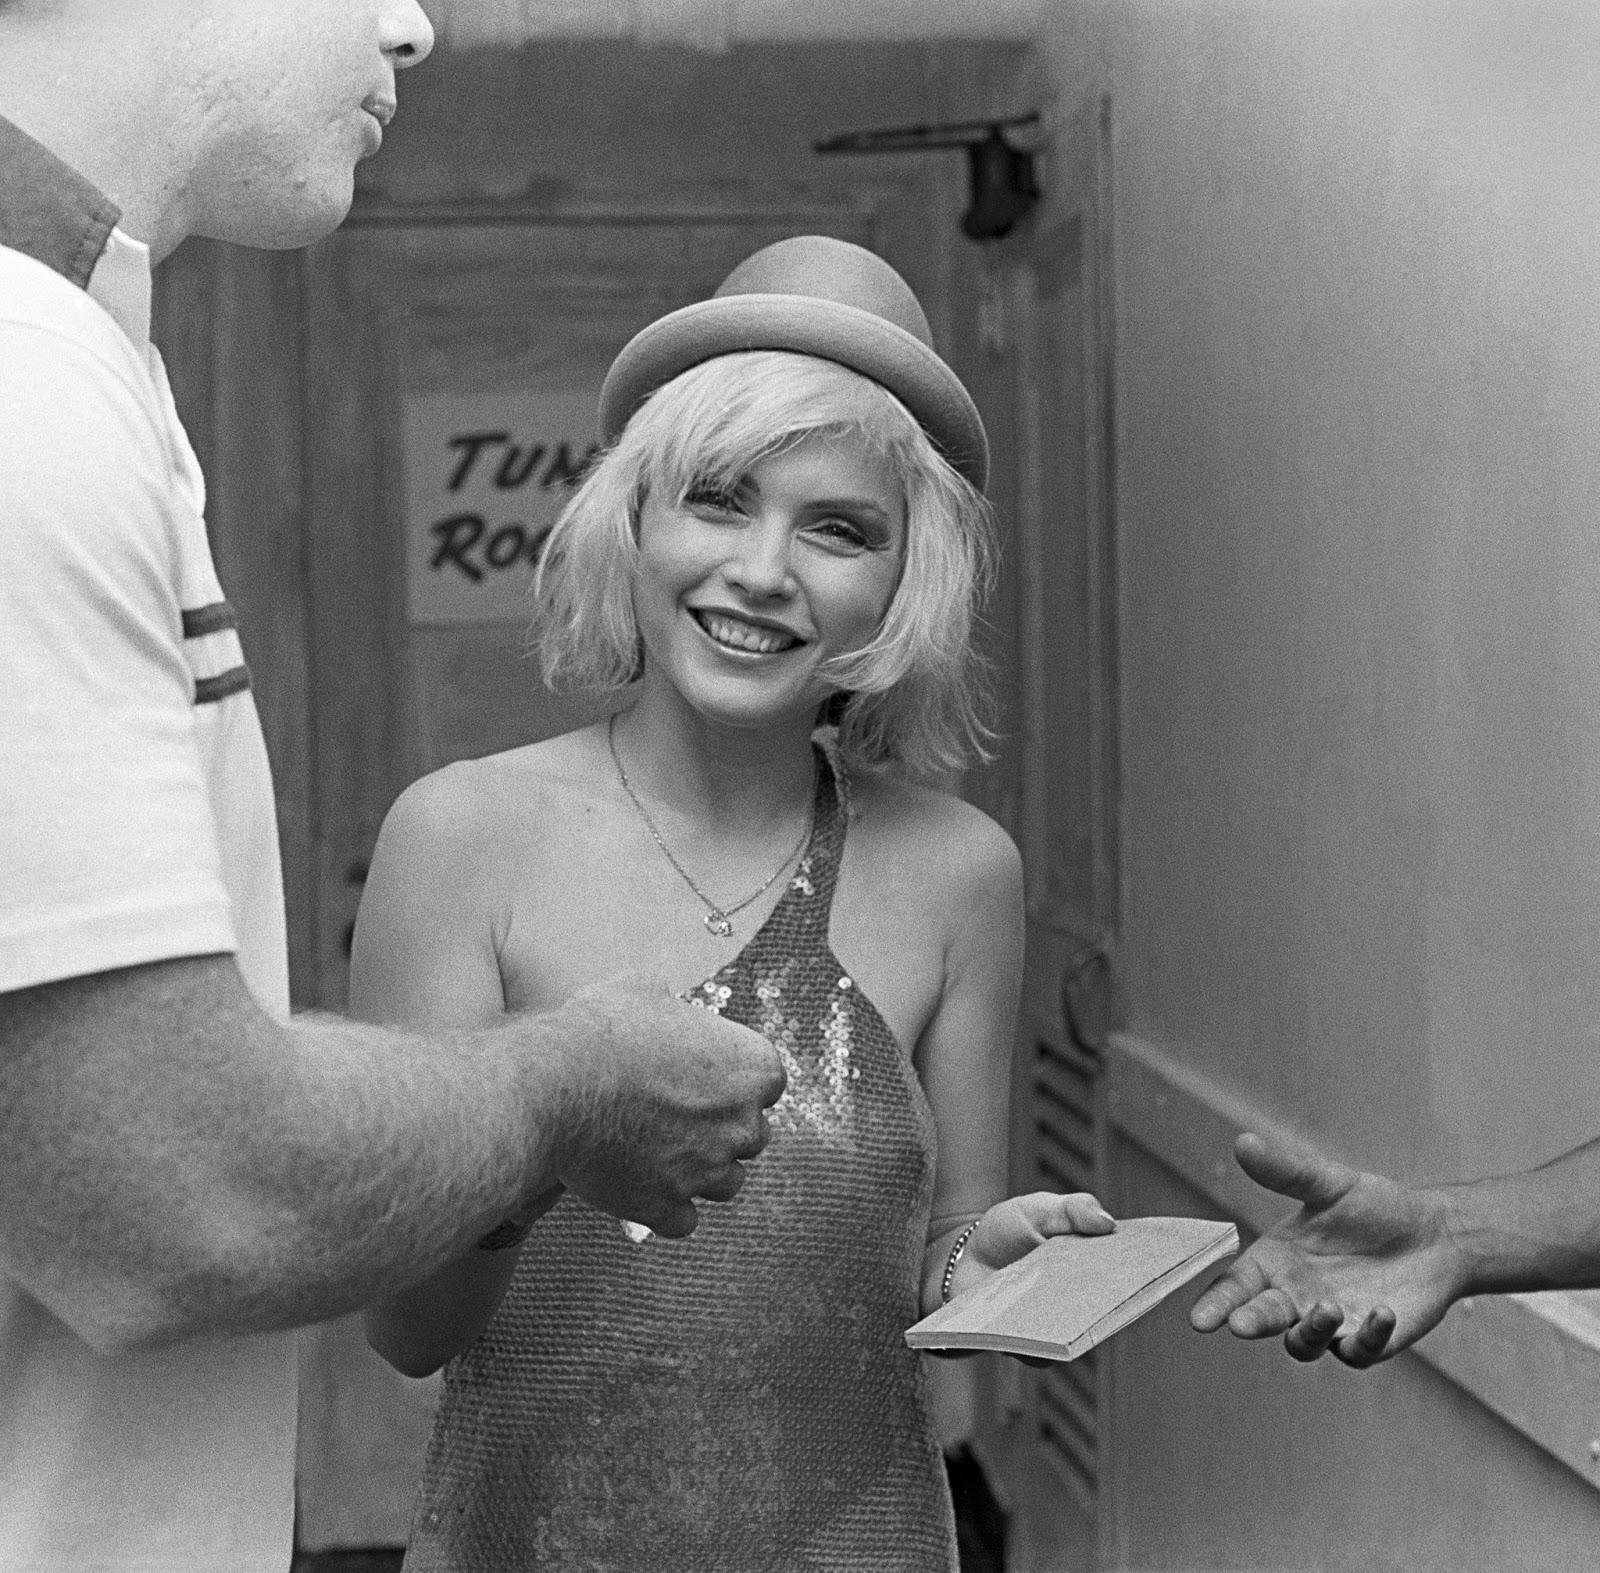 nude Debbie harry upskirt